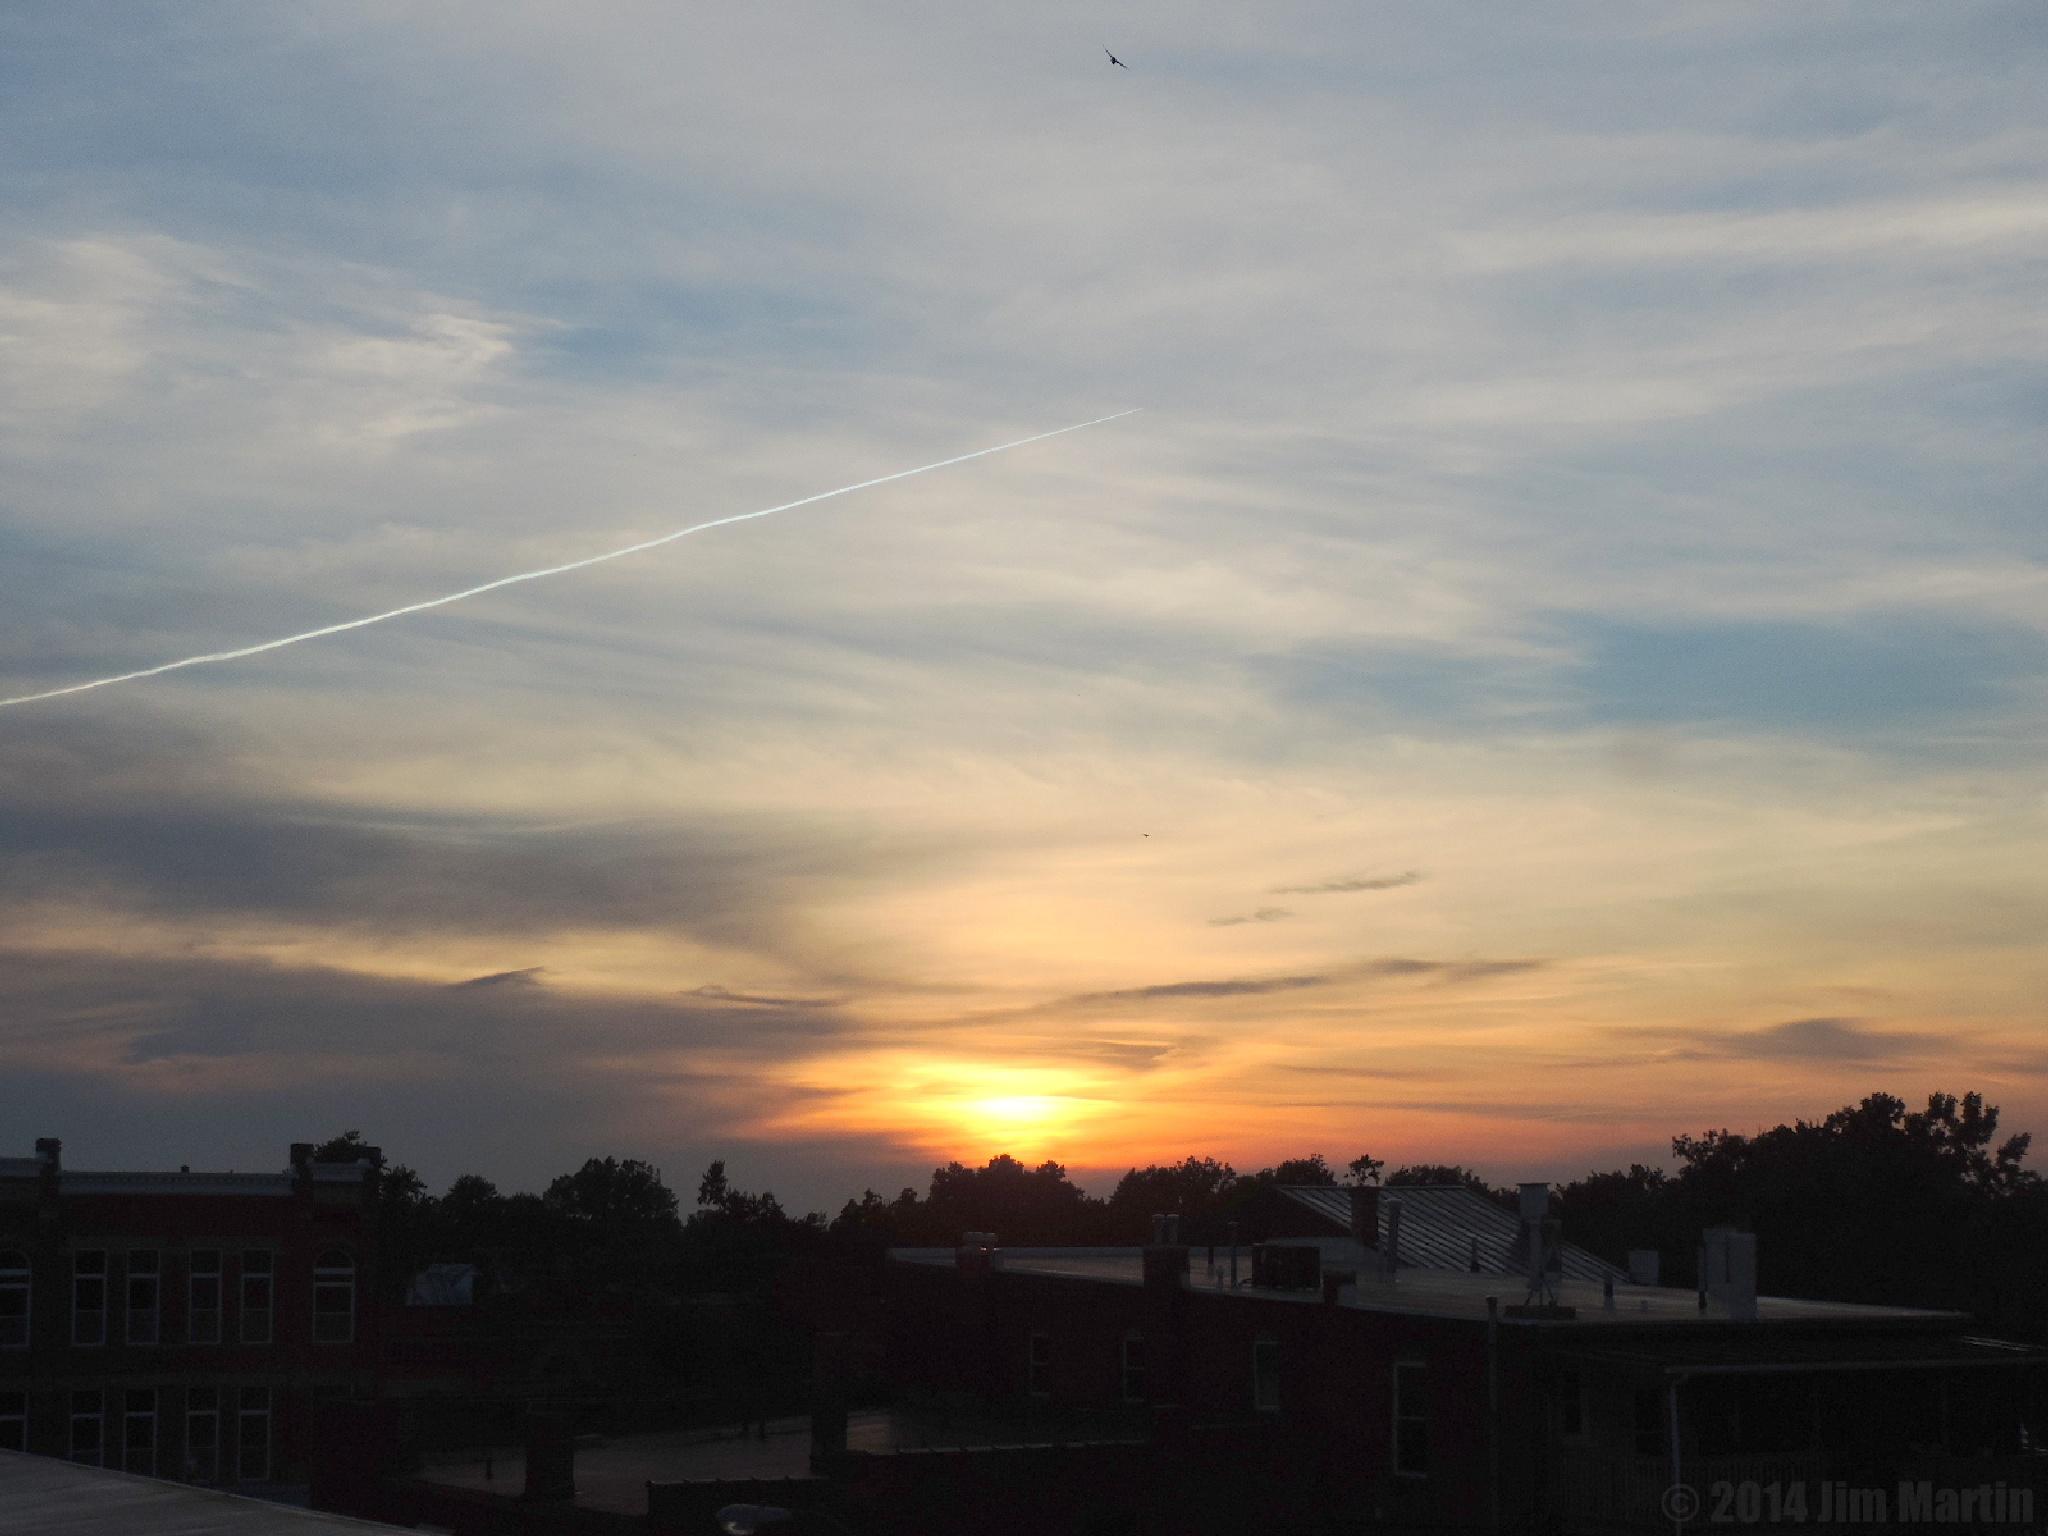 Sunset by Jim Martin